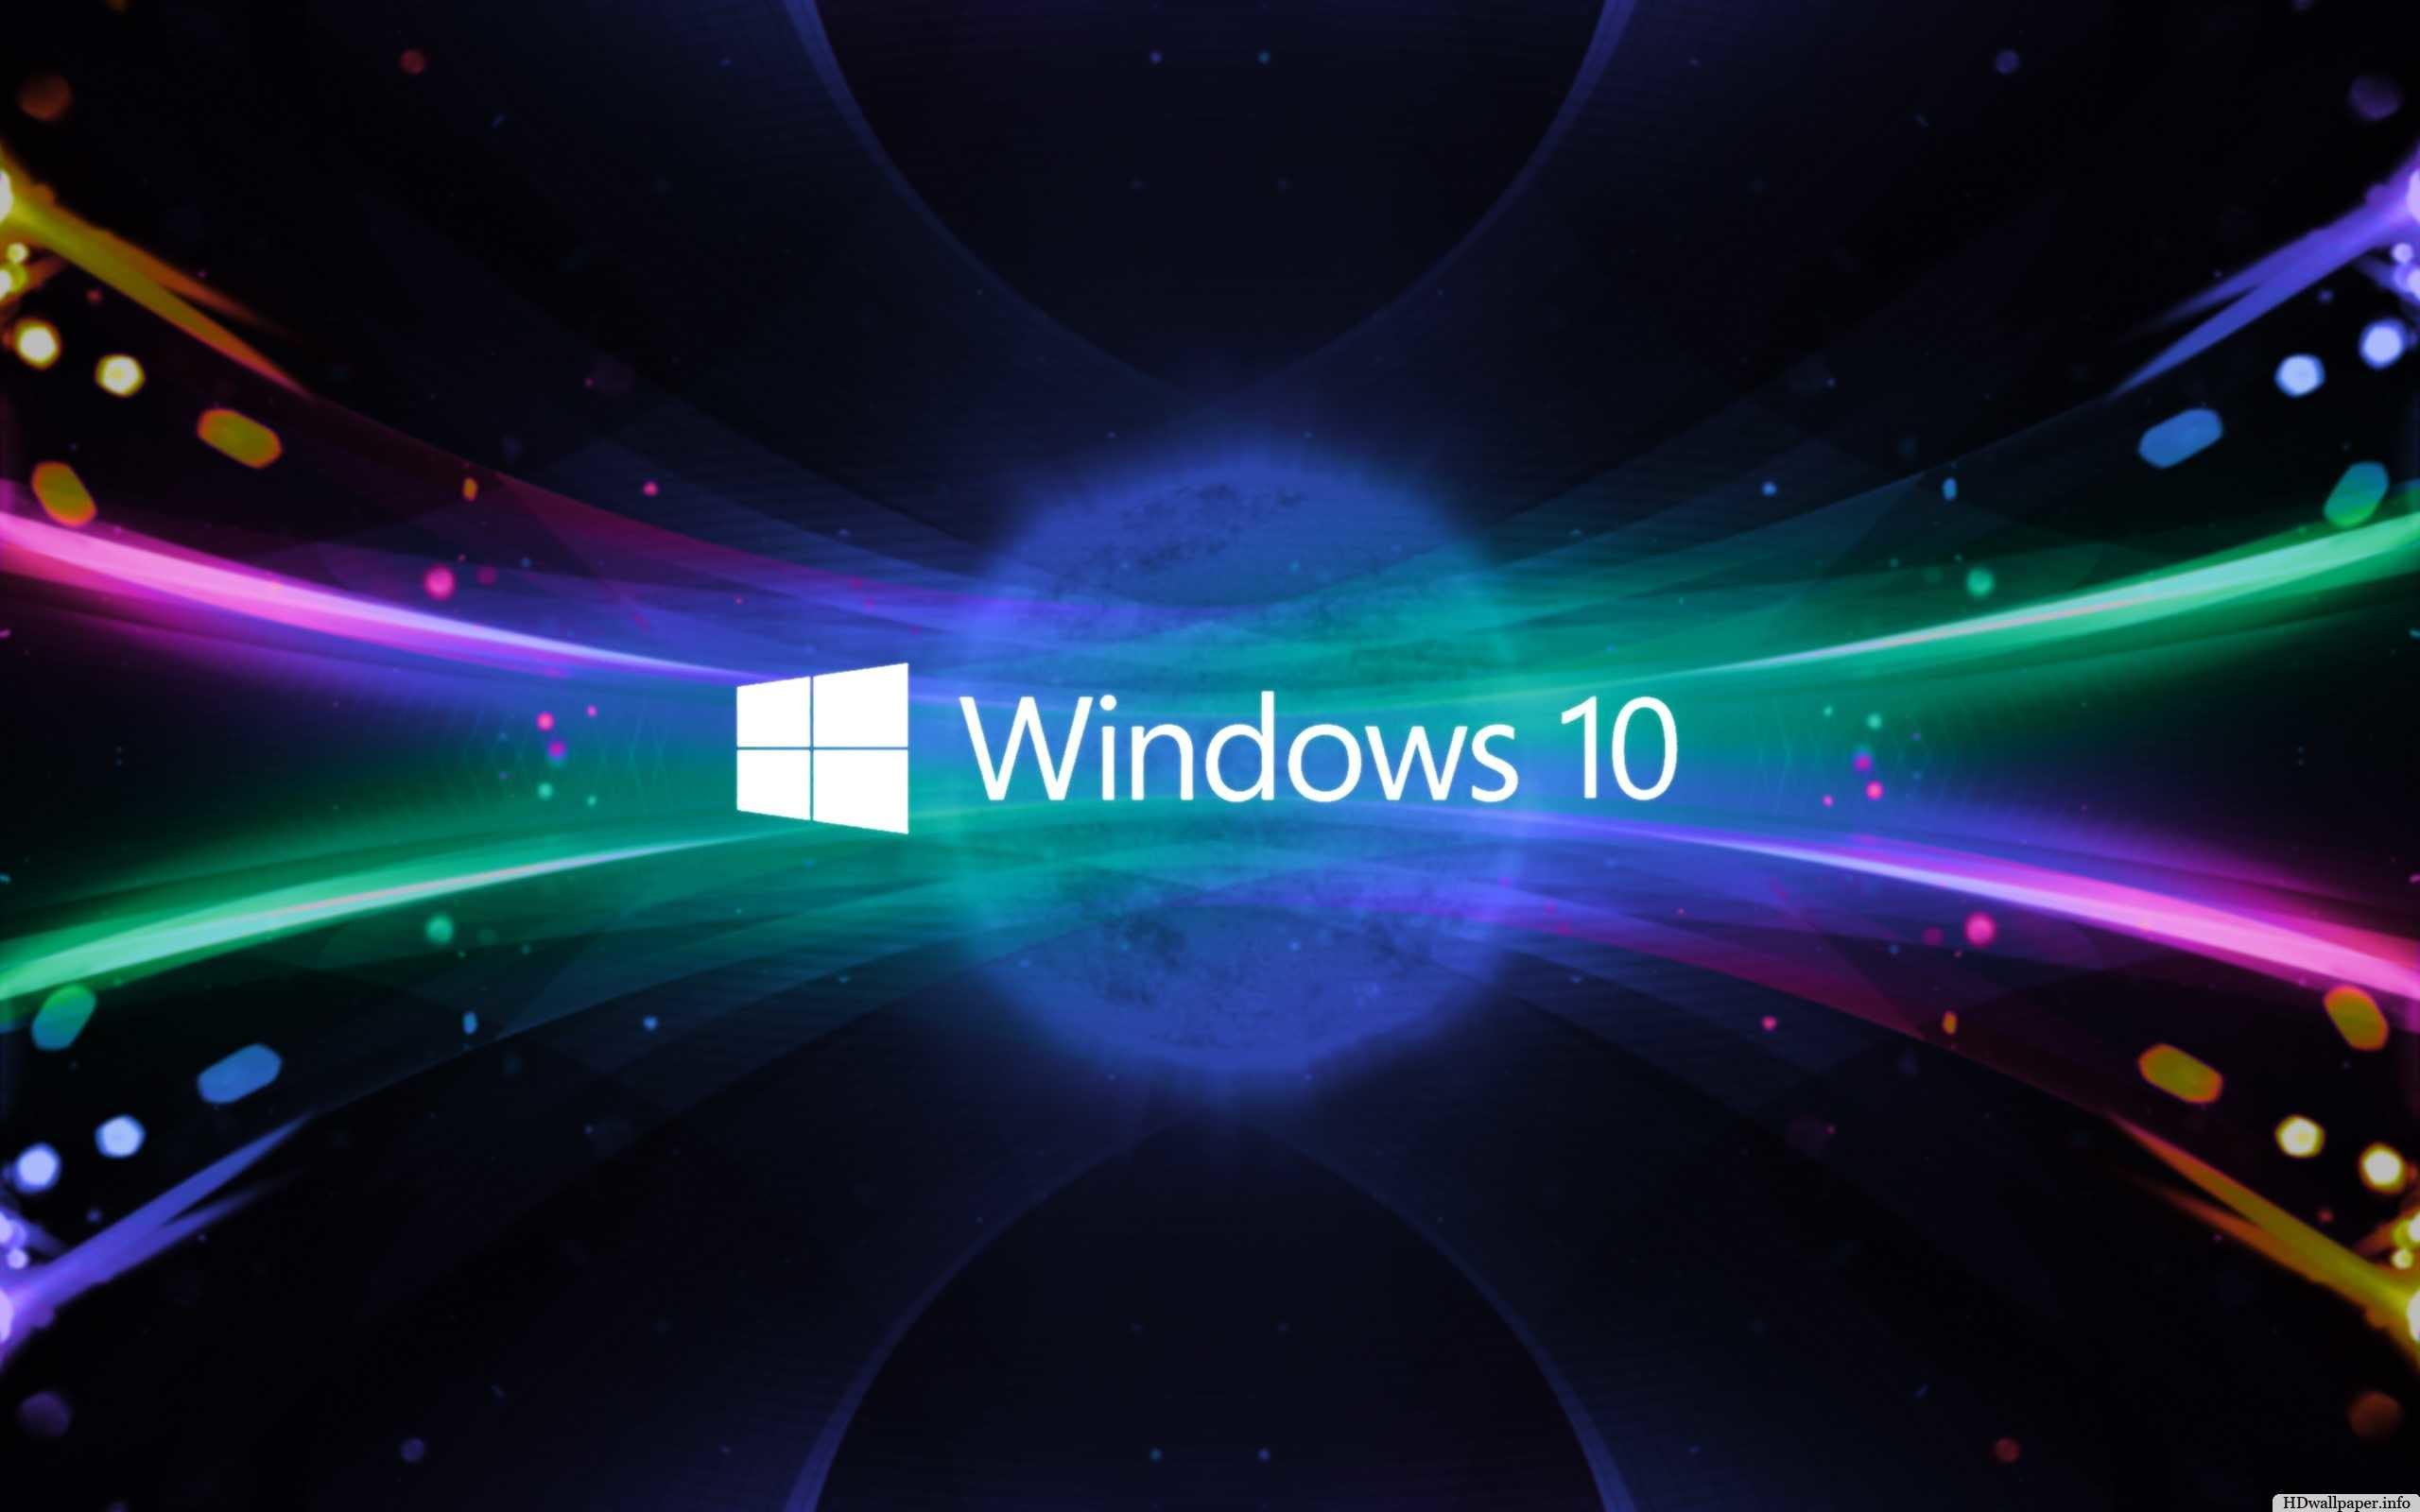 WoowPaper Windows 10 Wallpaper Hd 3d For Desktop